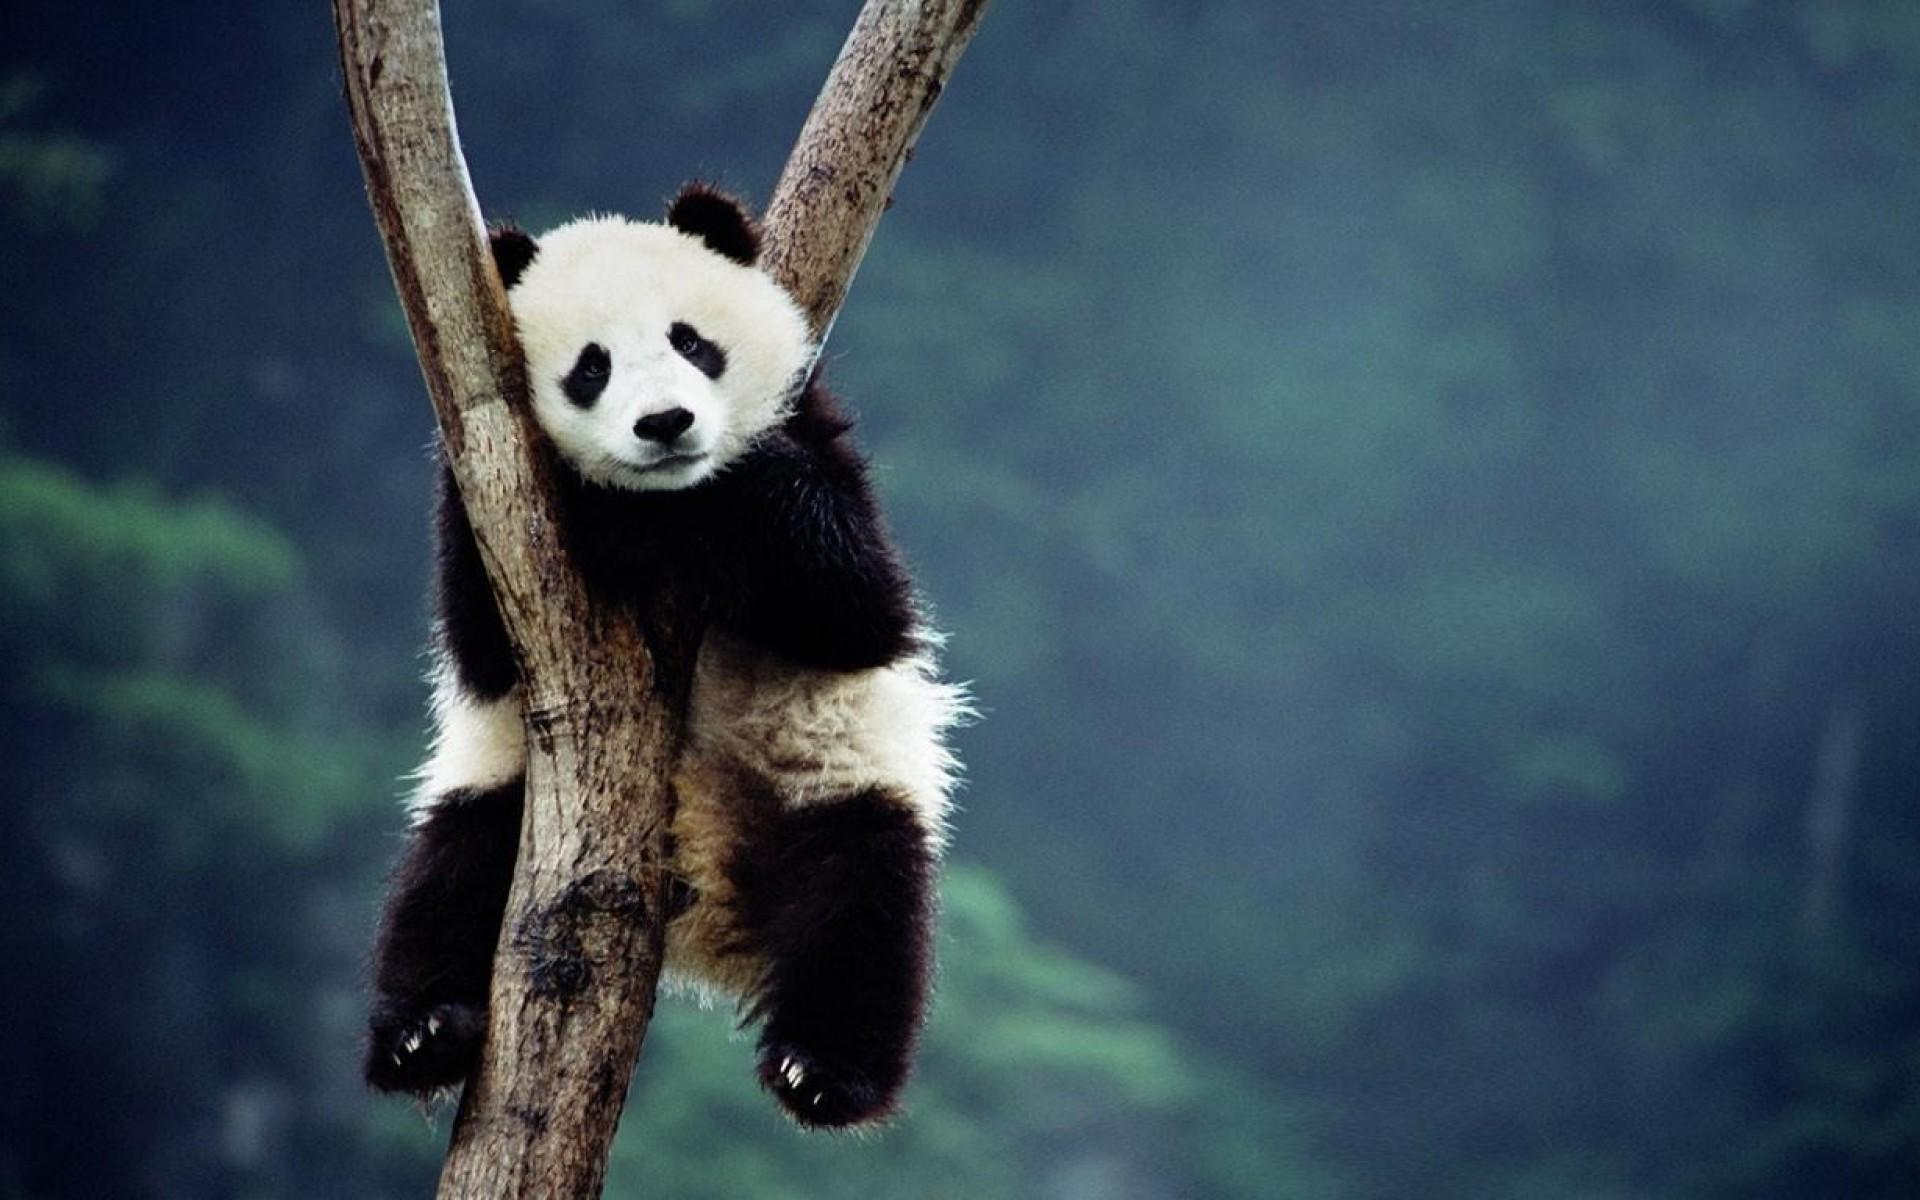 Baby Panda HD Desktop Wallpapers 9466 – Amazing Wallpaperz